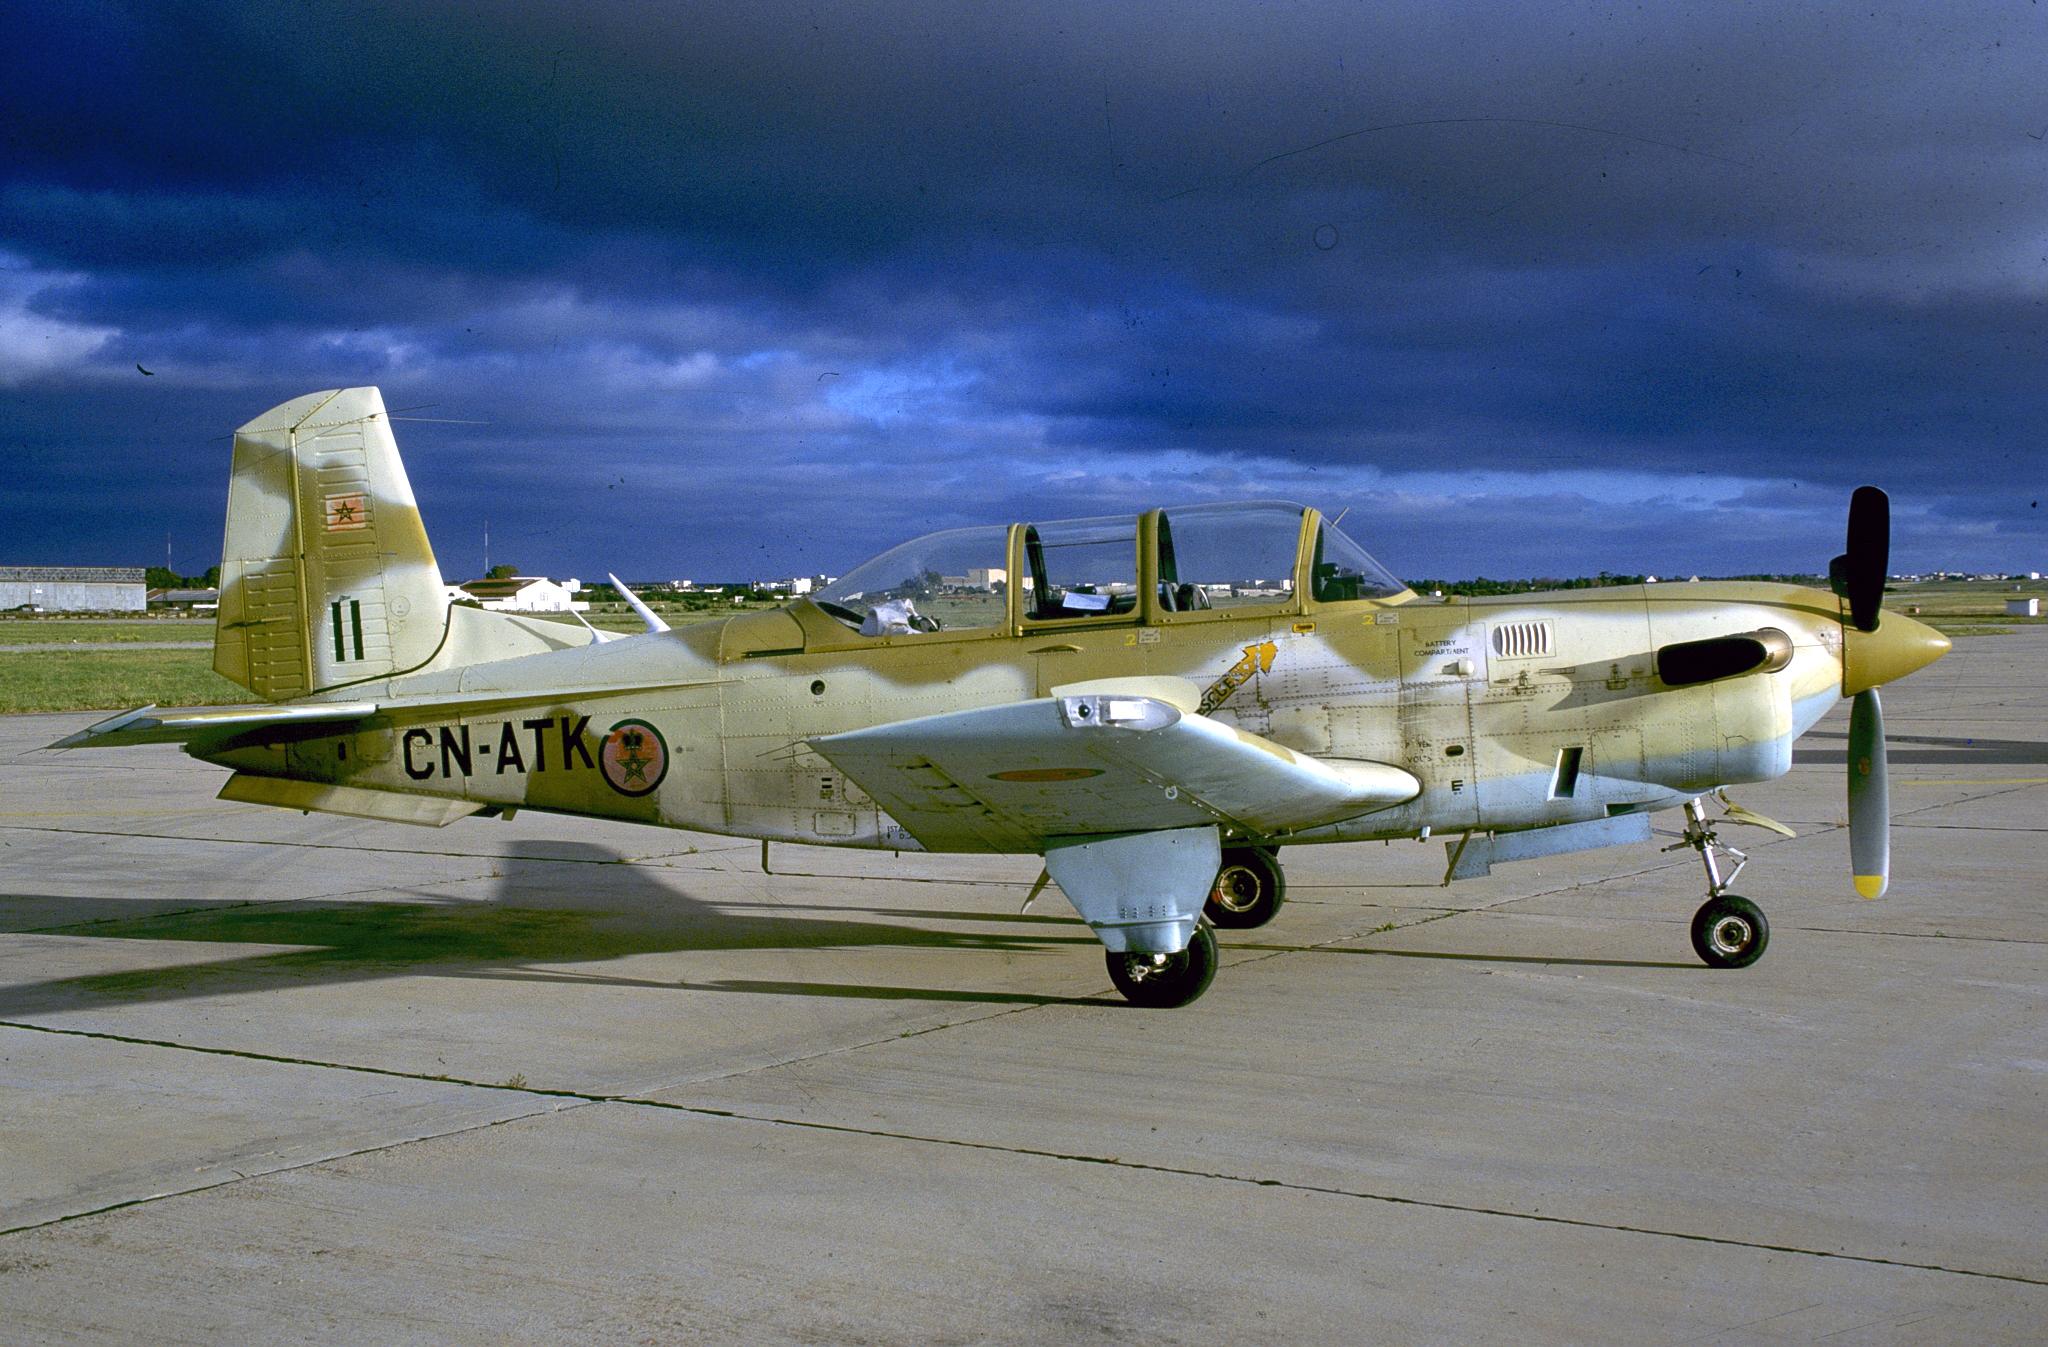 FRA: Photos anciens avions des FRA - Page 7 151226025346257276